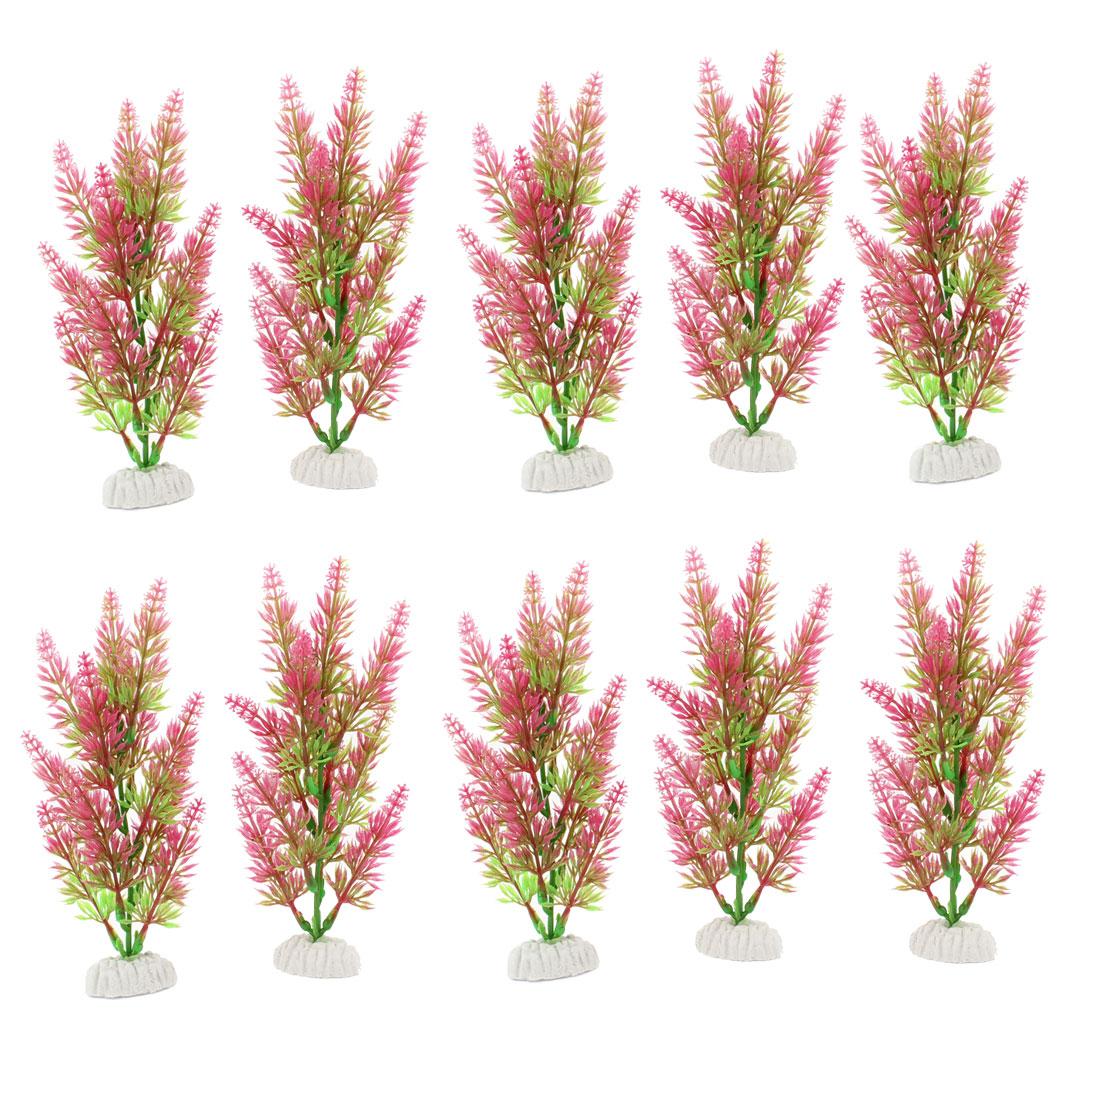 "10 Pcs 7.7"" Height Ceramic Base Green Hot Pink Manmade Plant for Fish Tank"